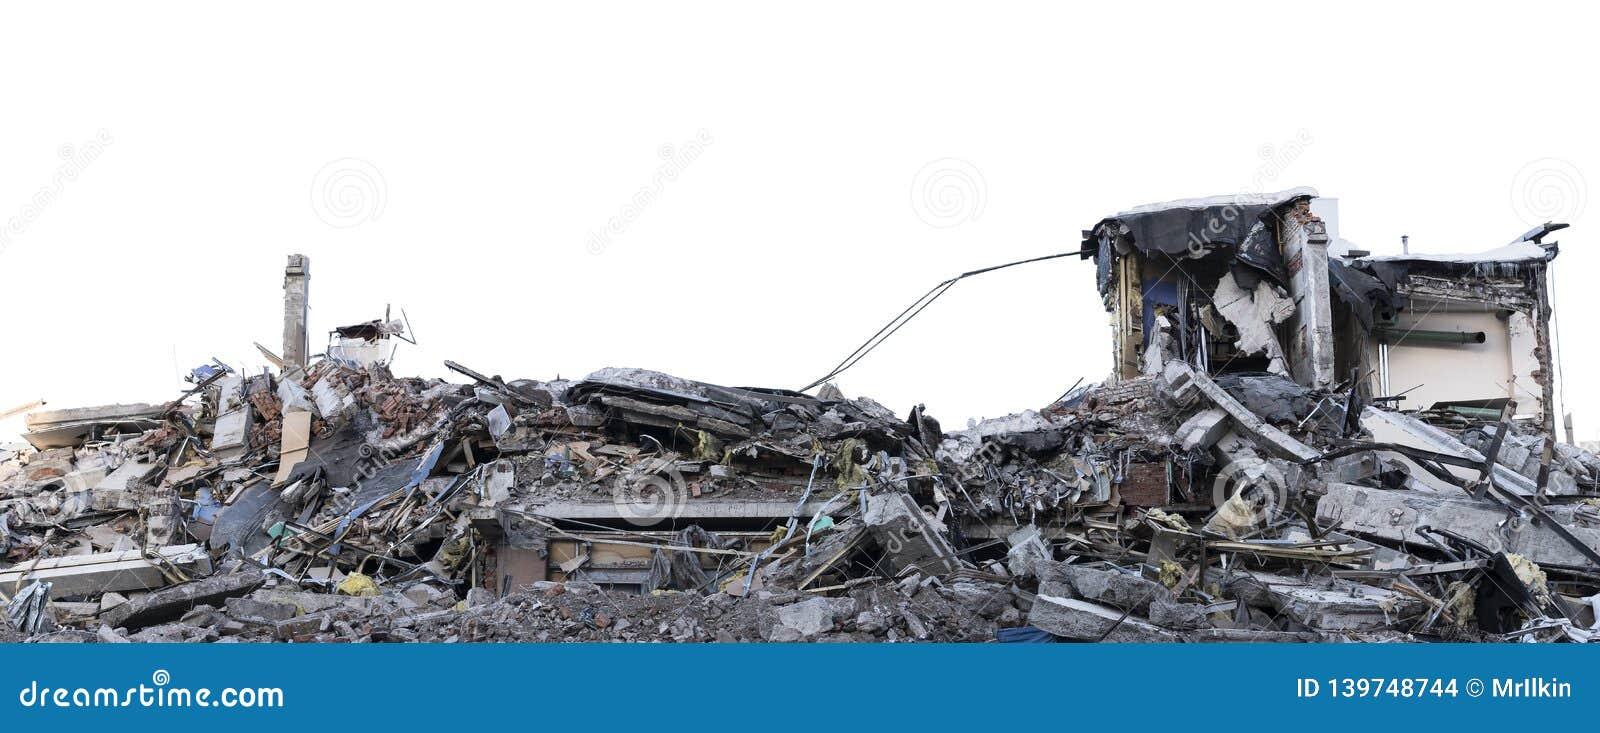 Pila aislada de escombros de un edificio desmontado en un sitio de demolición